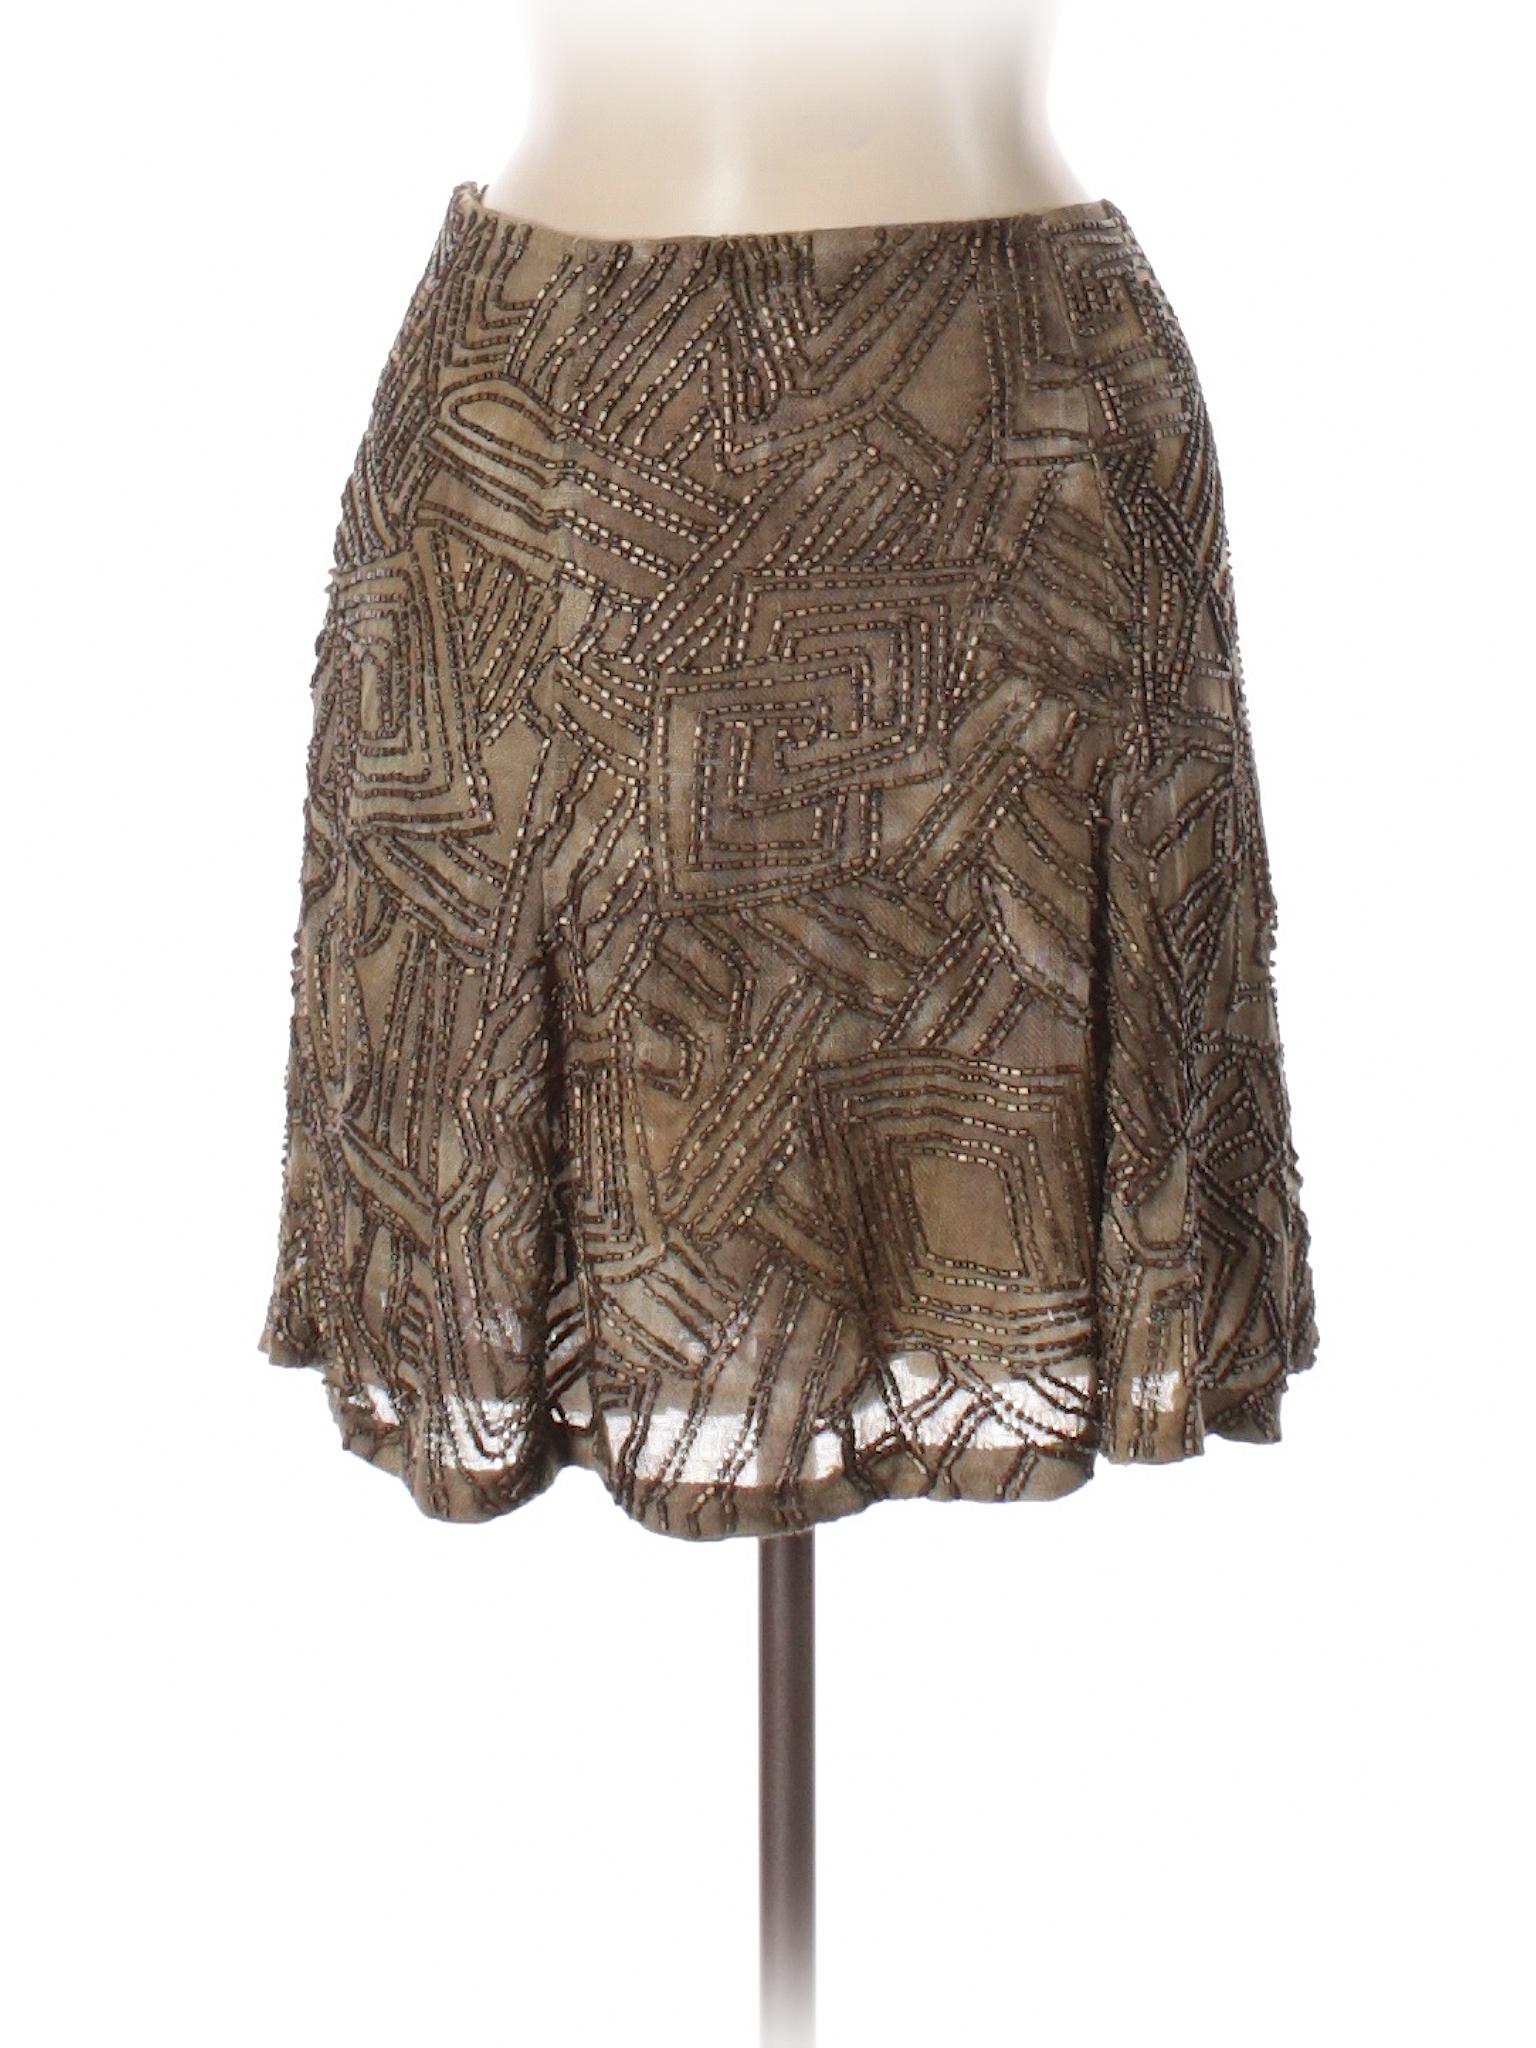 Boutique Lauren Ralph Lauren Skirt Boutique Ralph Formal Formal BAPOqwnx